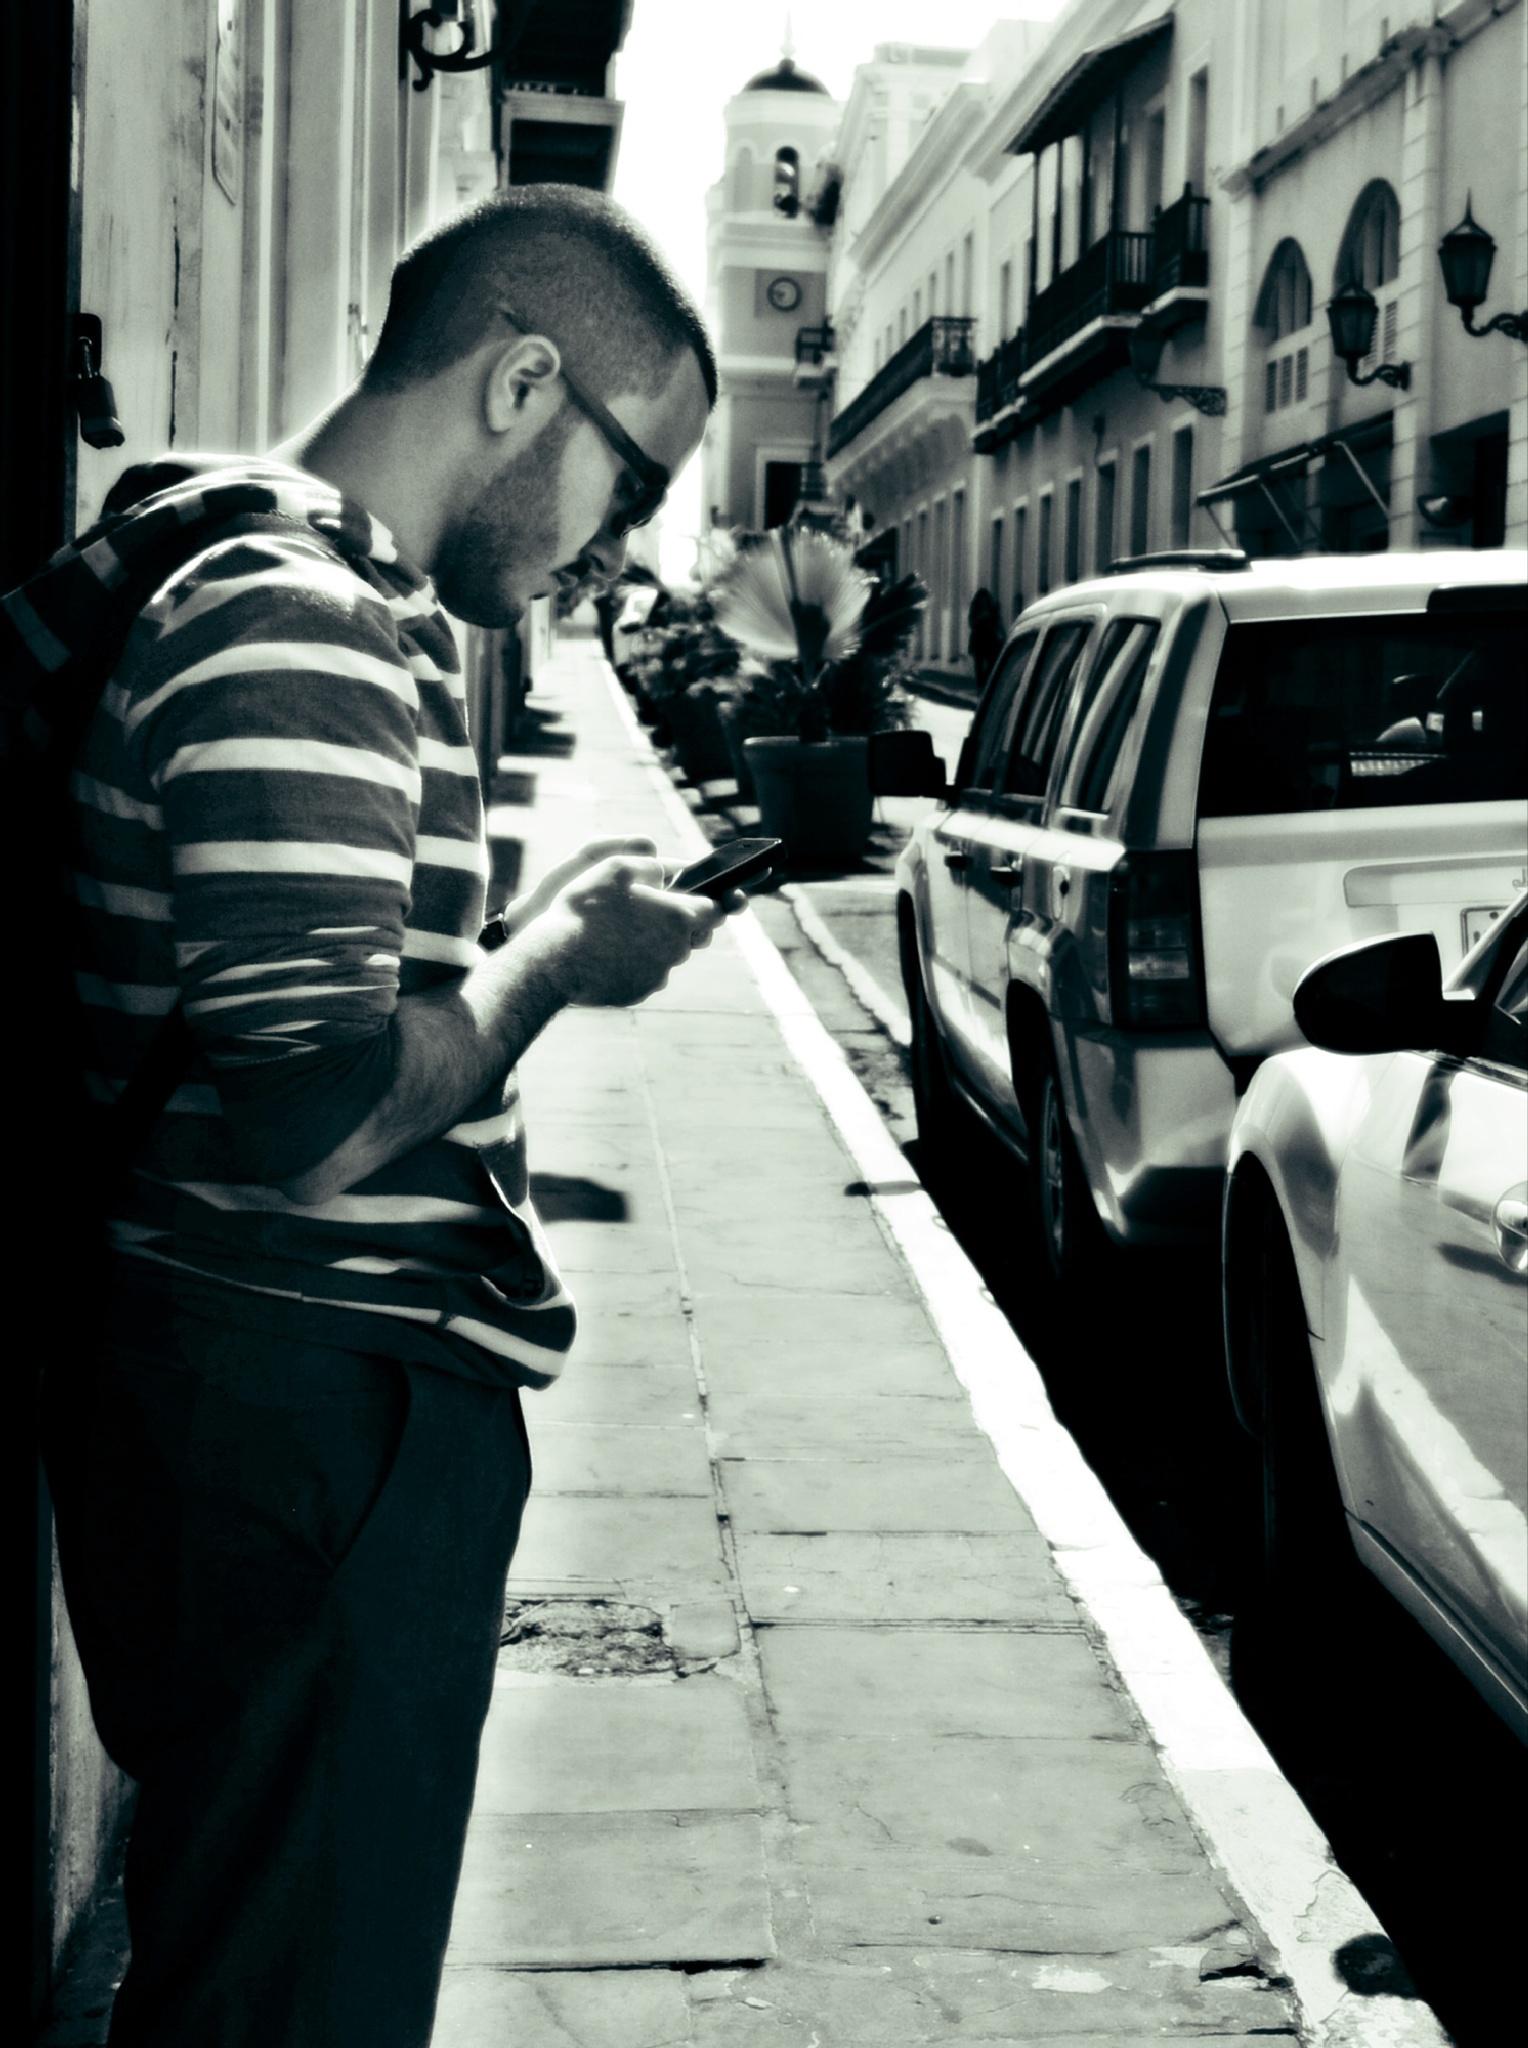 Texting by Nilda64pr